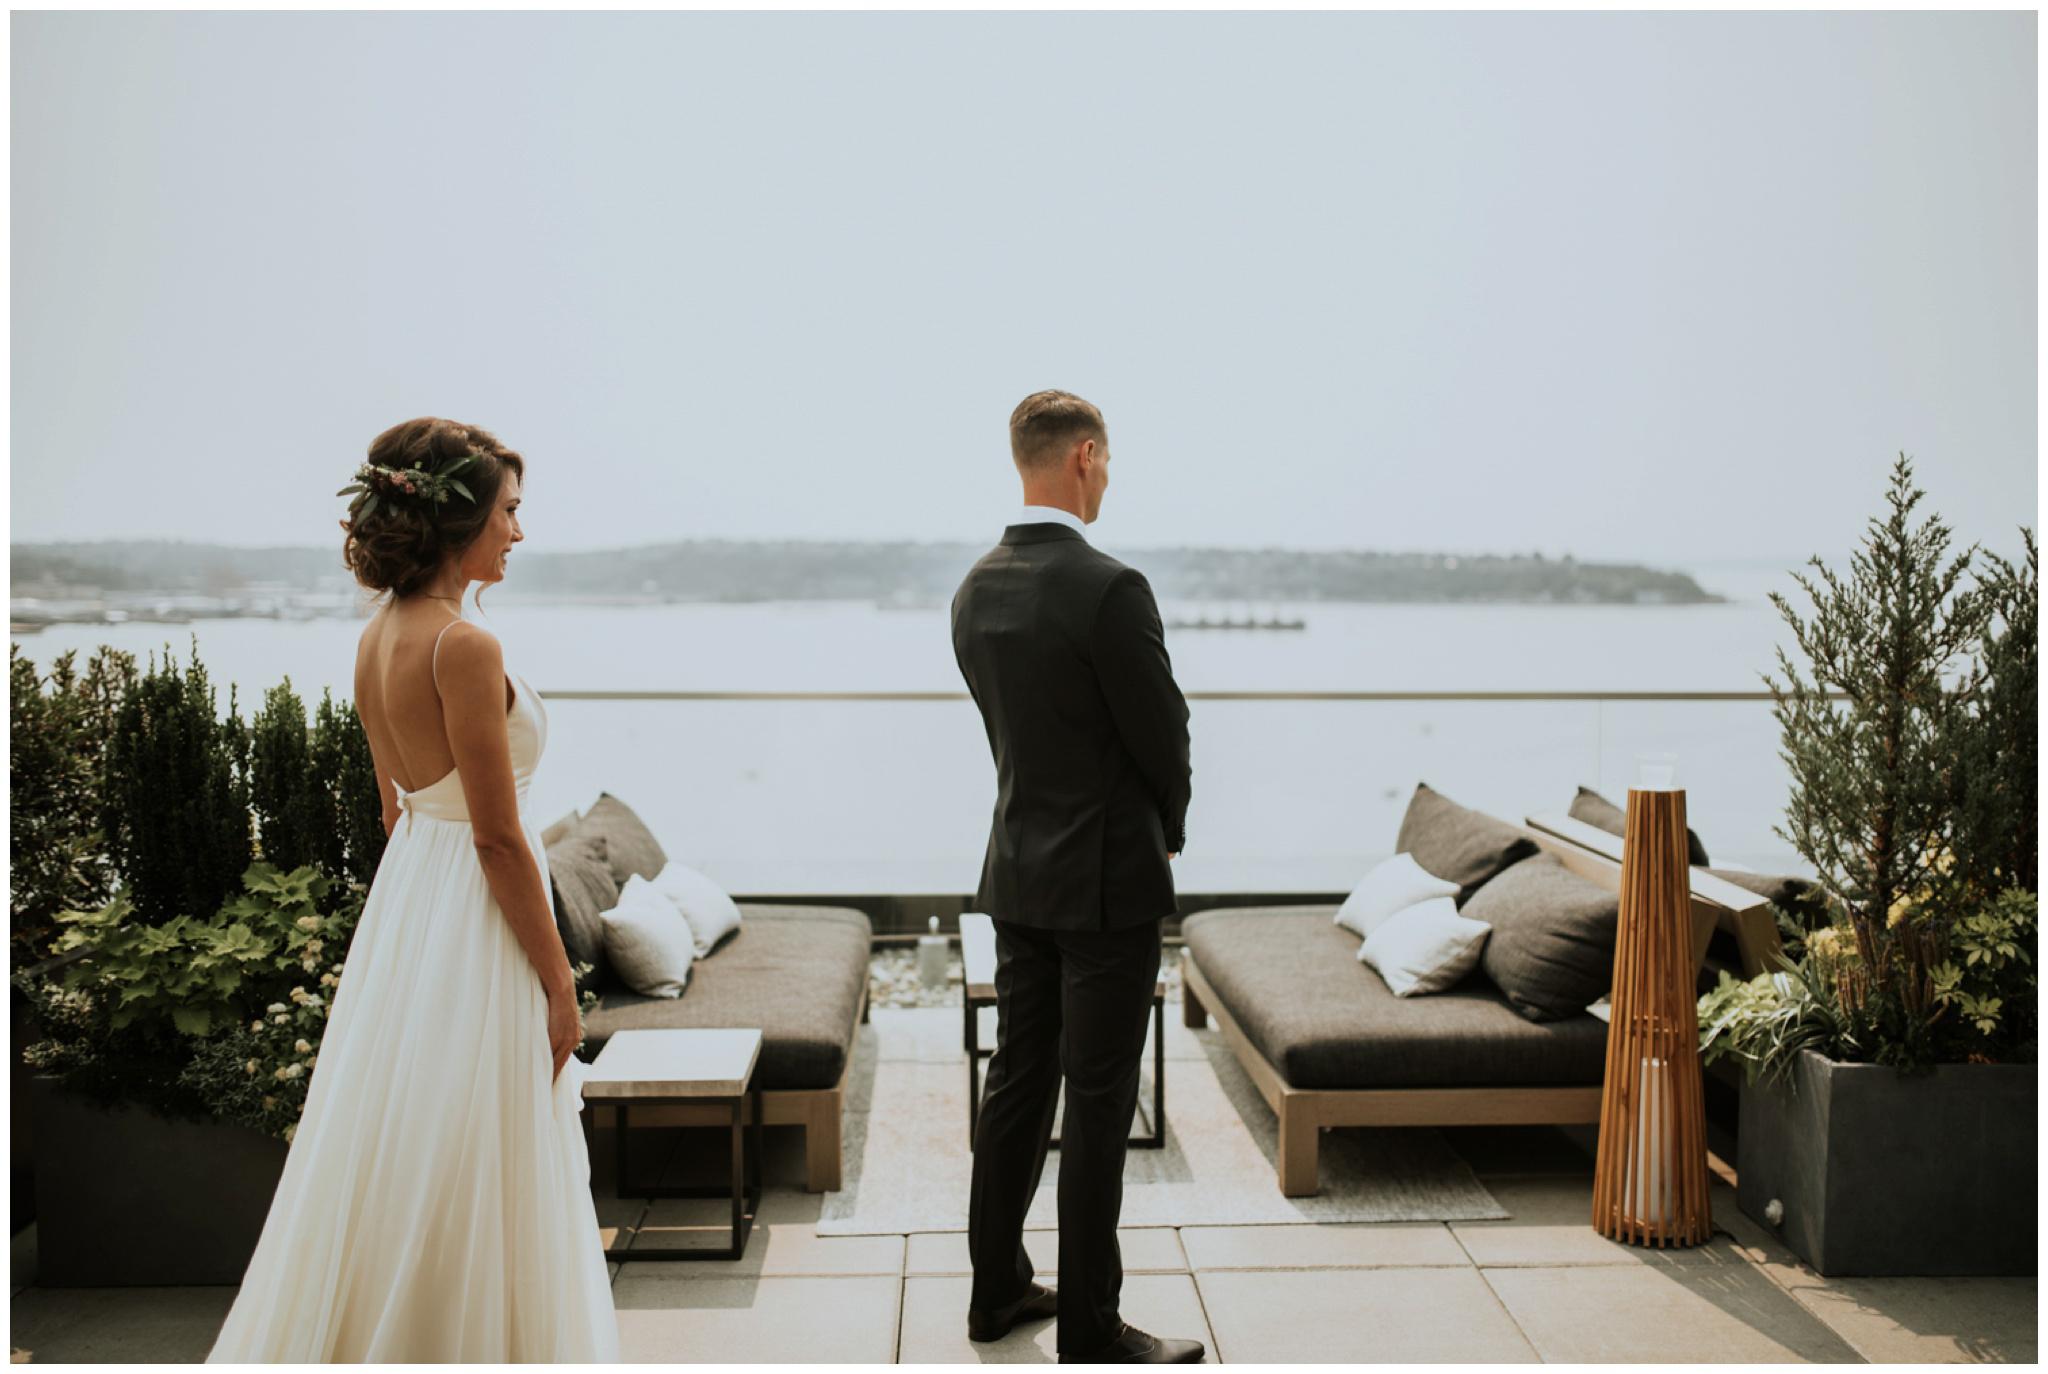 alyssa-keiran-westland-distillery-urban-seattle-wedding-photographer-caitlyn-nikula-46.jpg